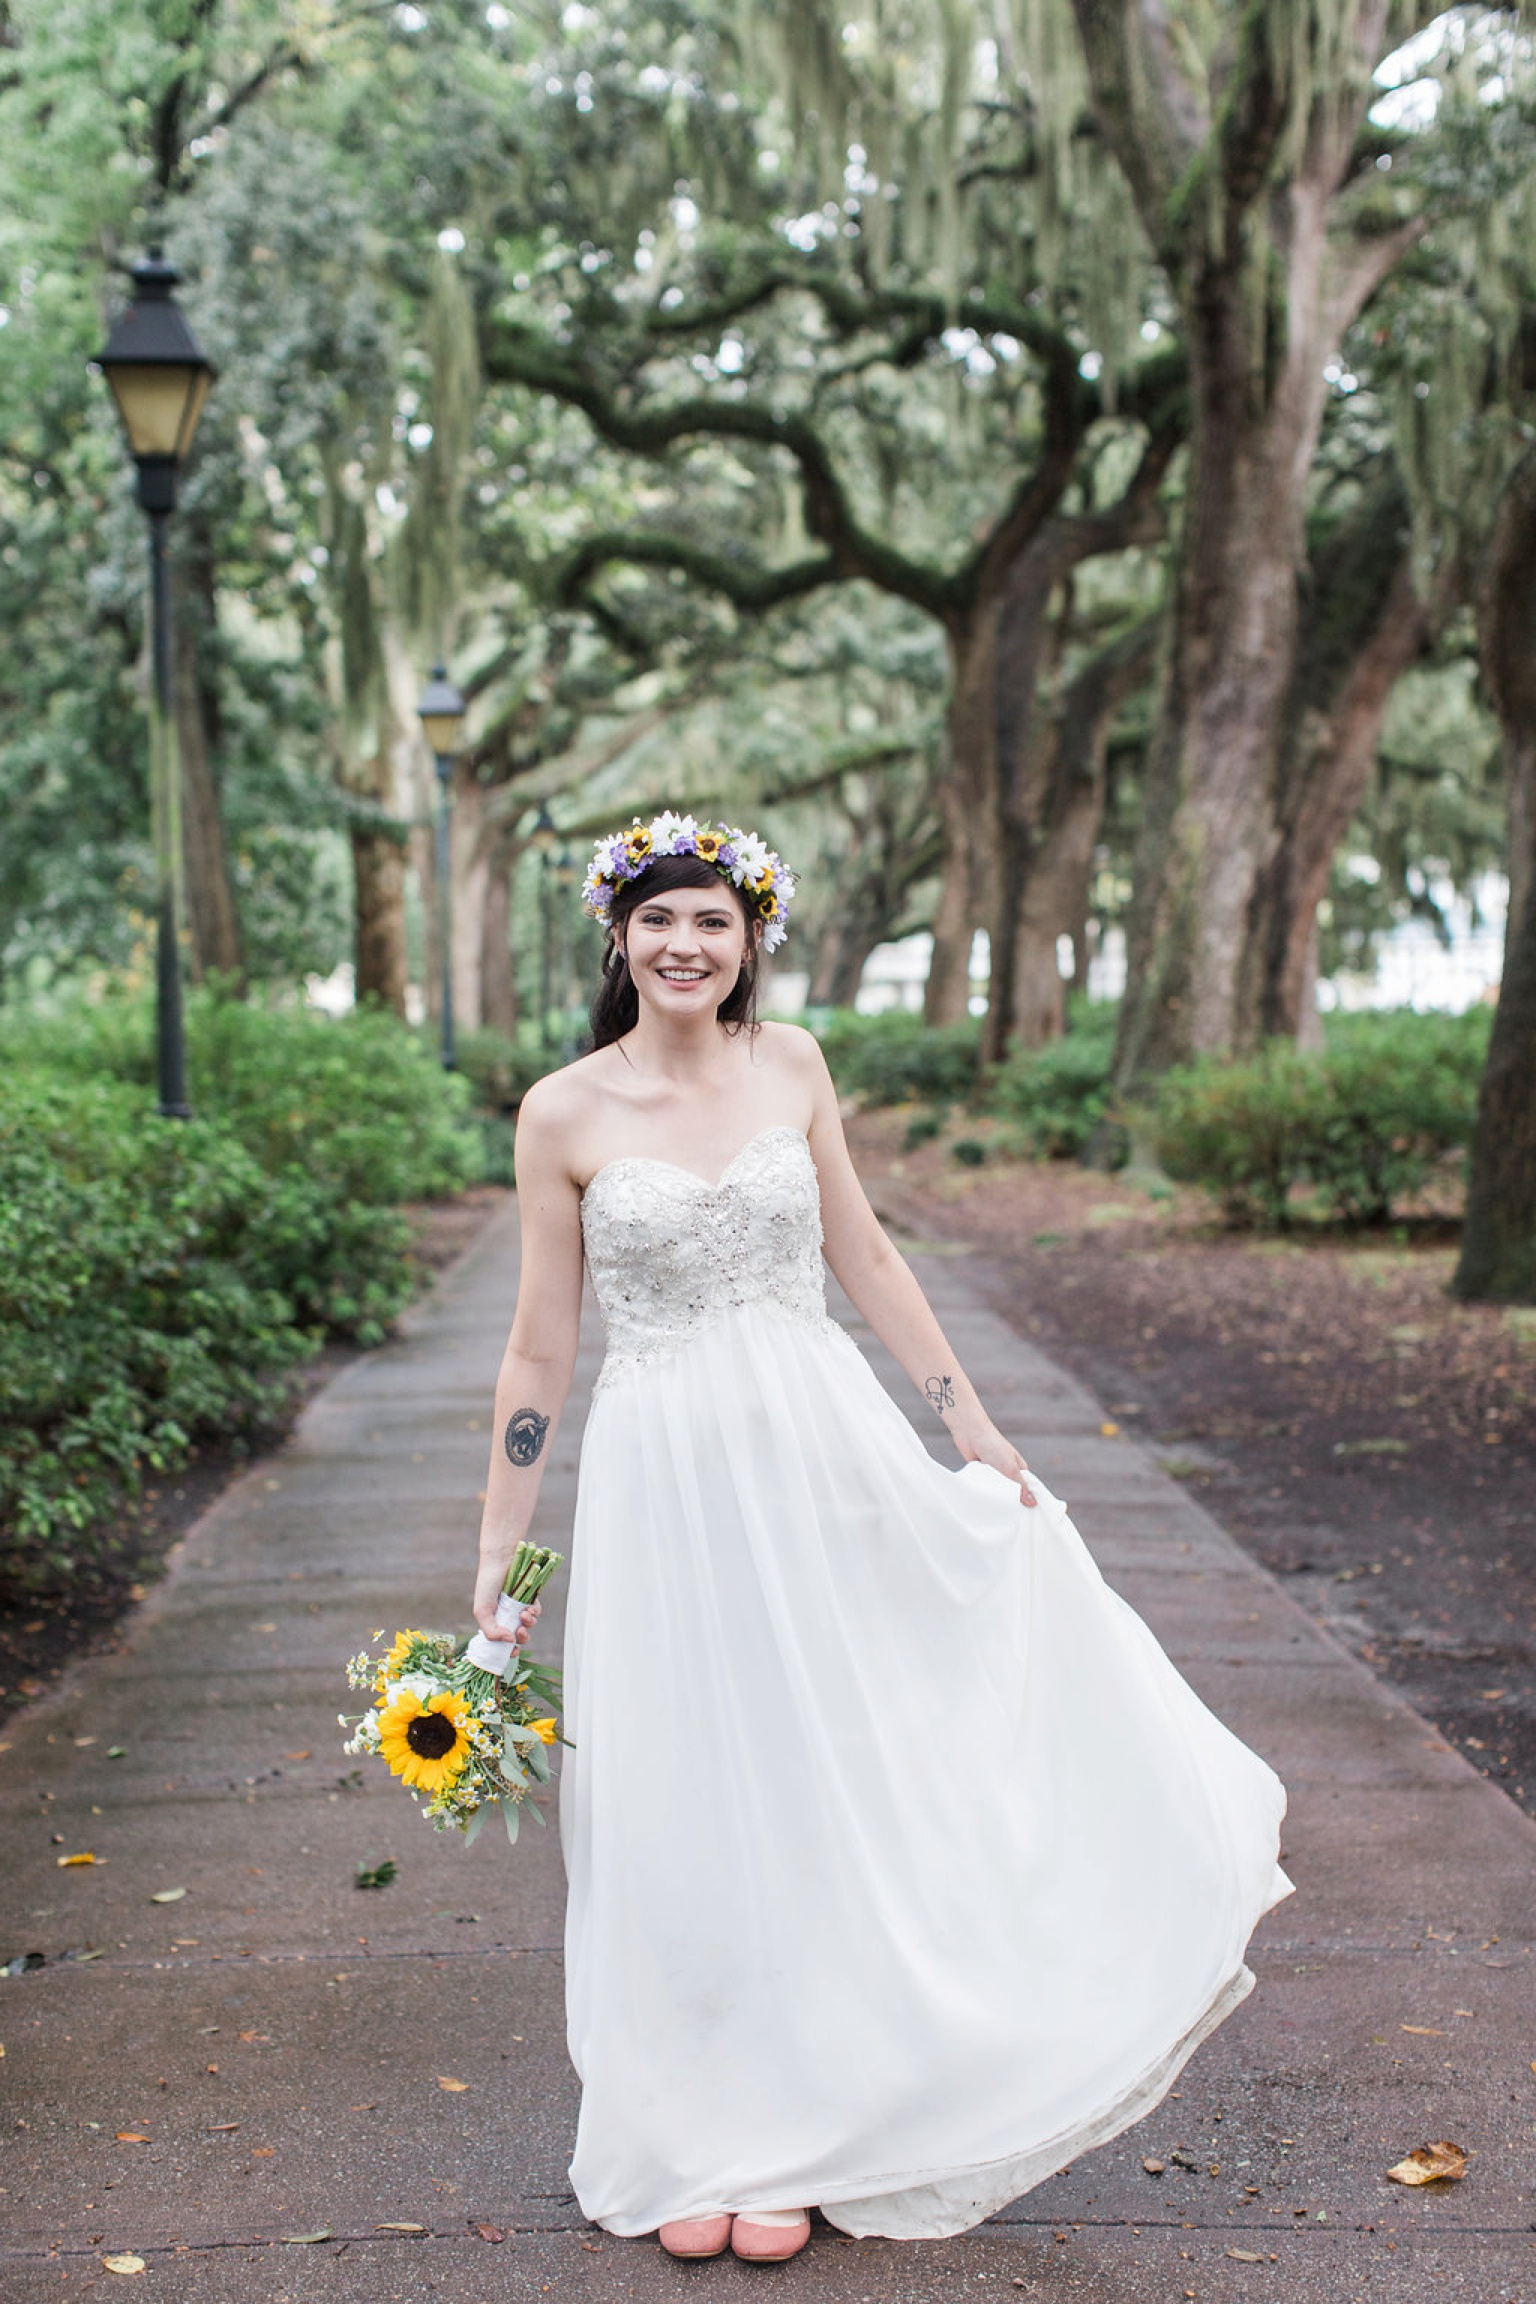 Apt_B_Photo_Savannah_Wedding_Photographer_Flower_Crown044.JPG